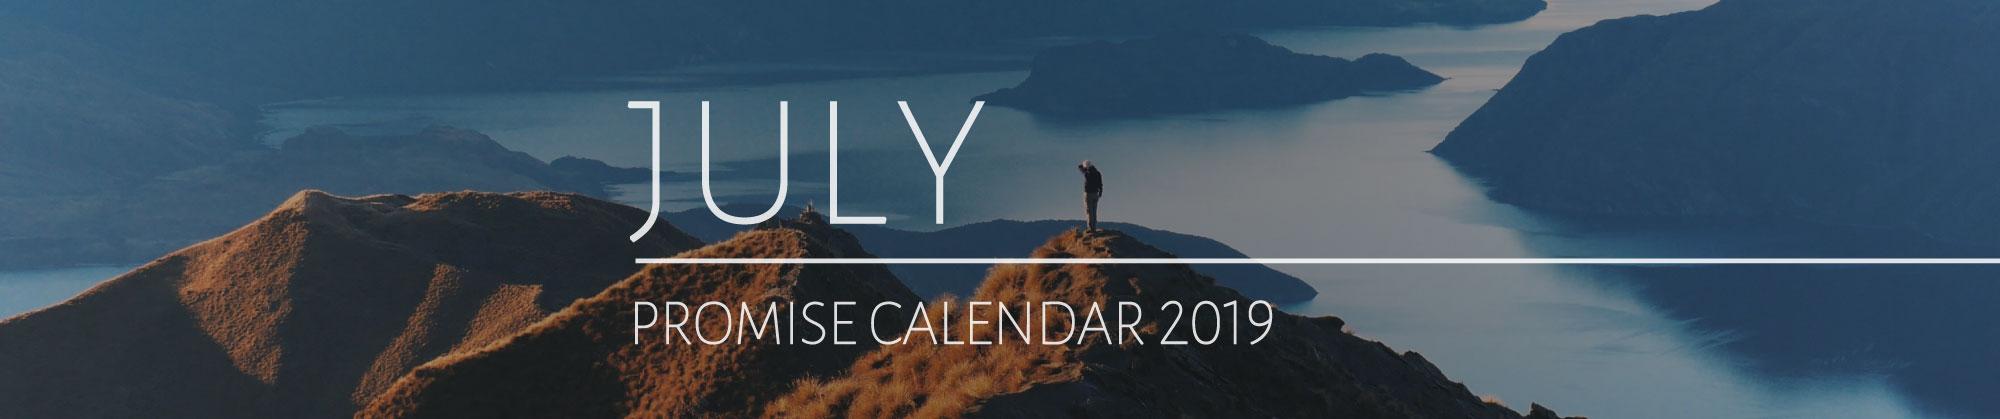 July 2019 Promise Calendar Header